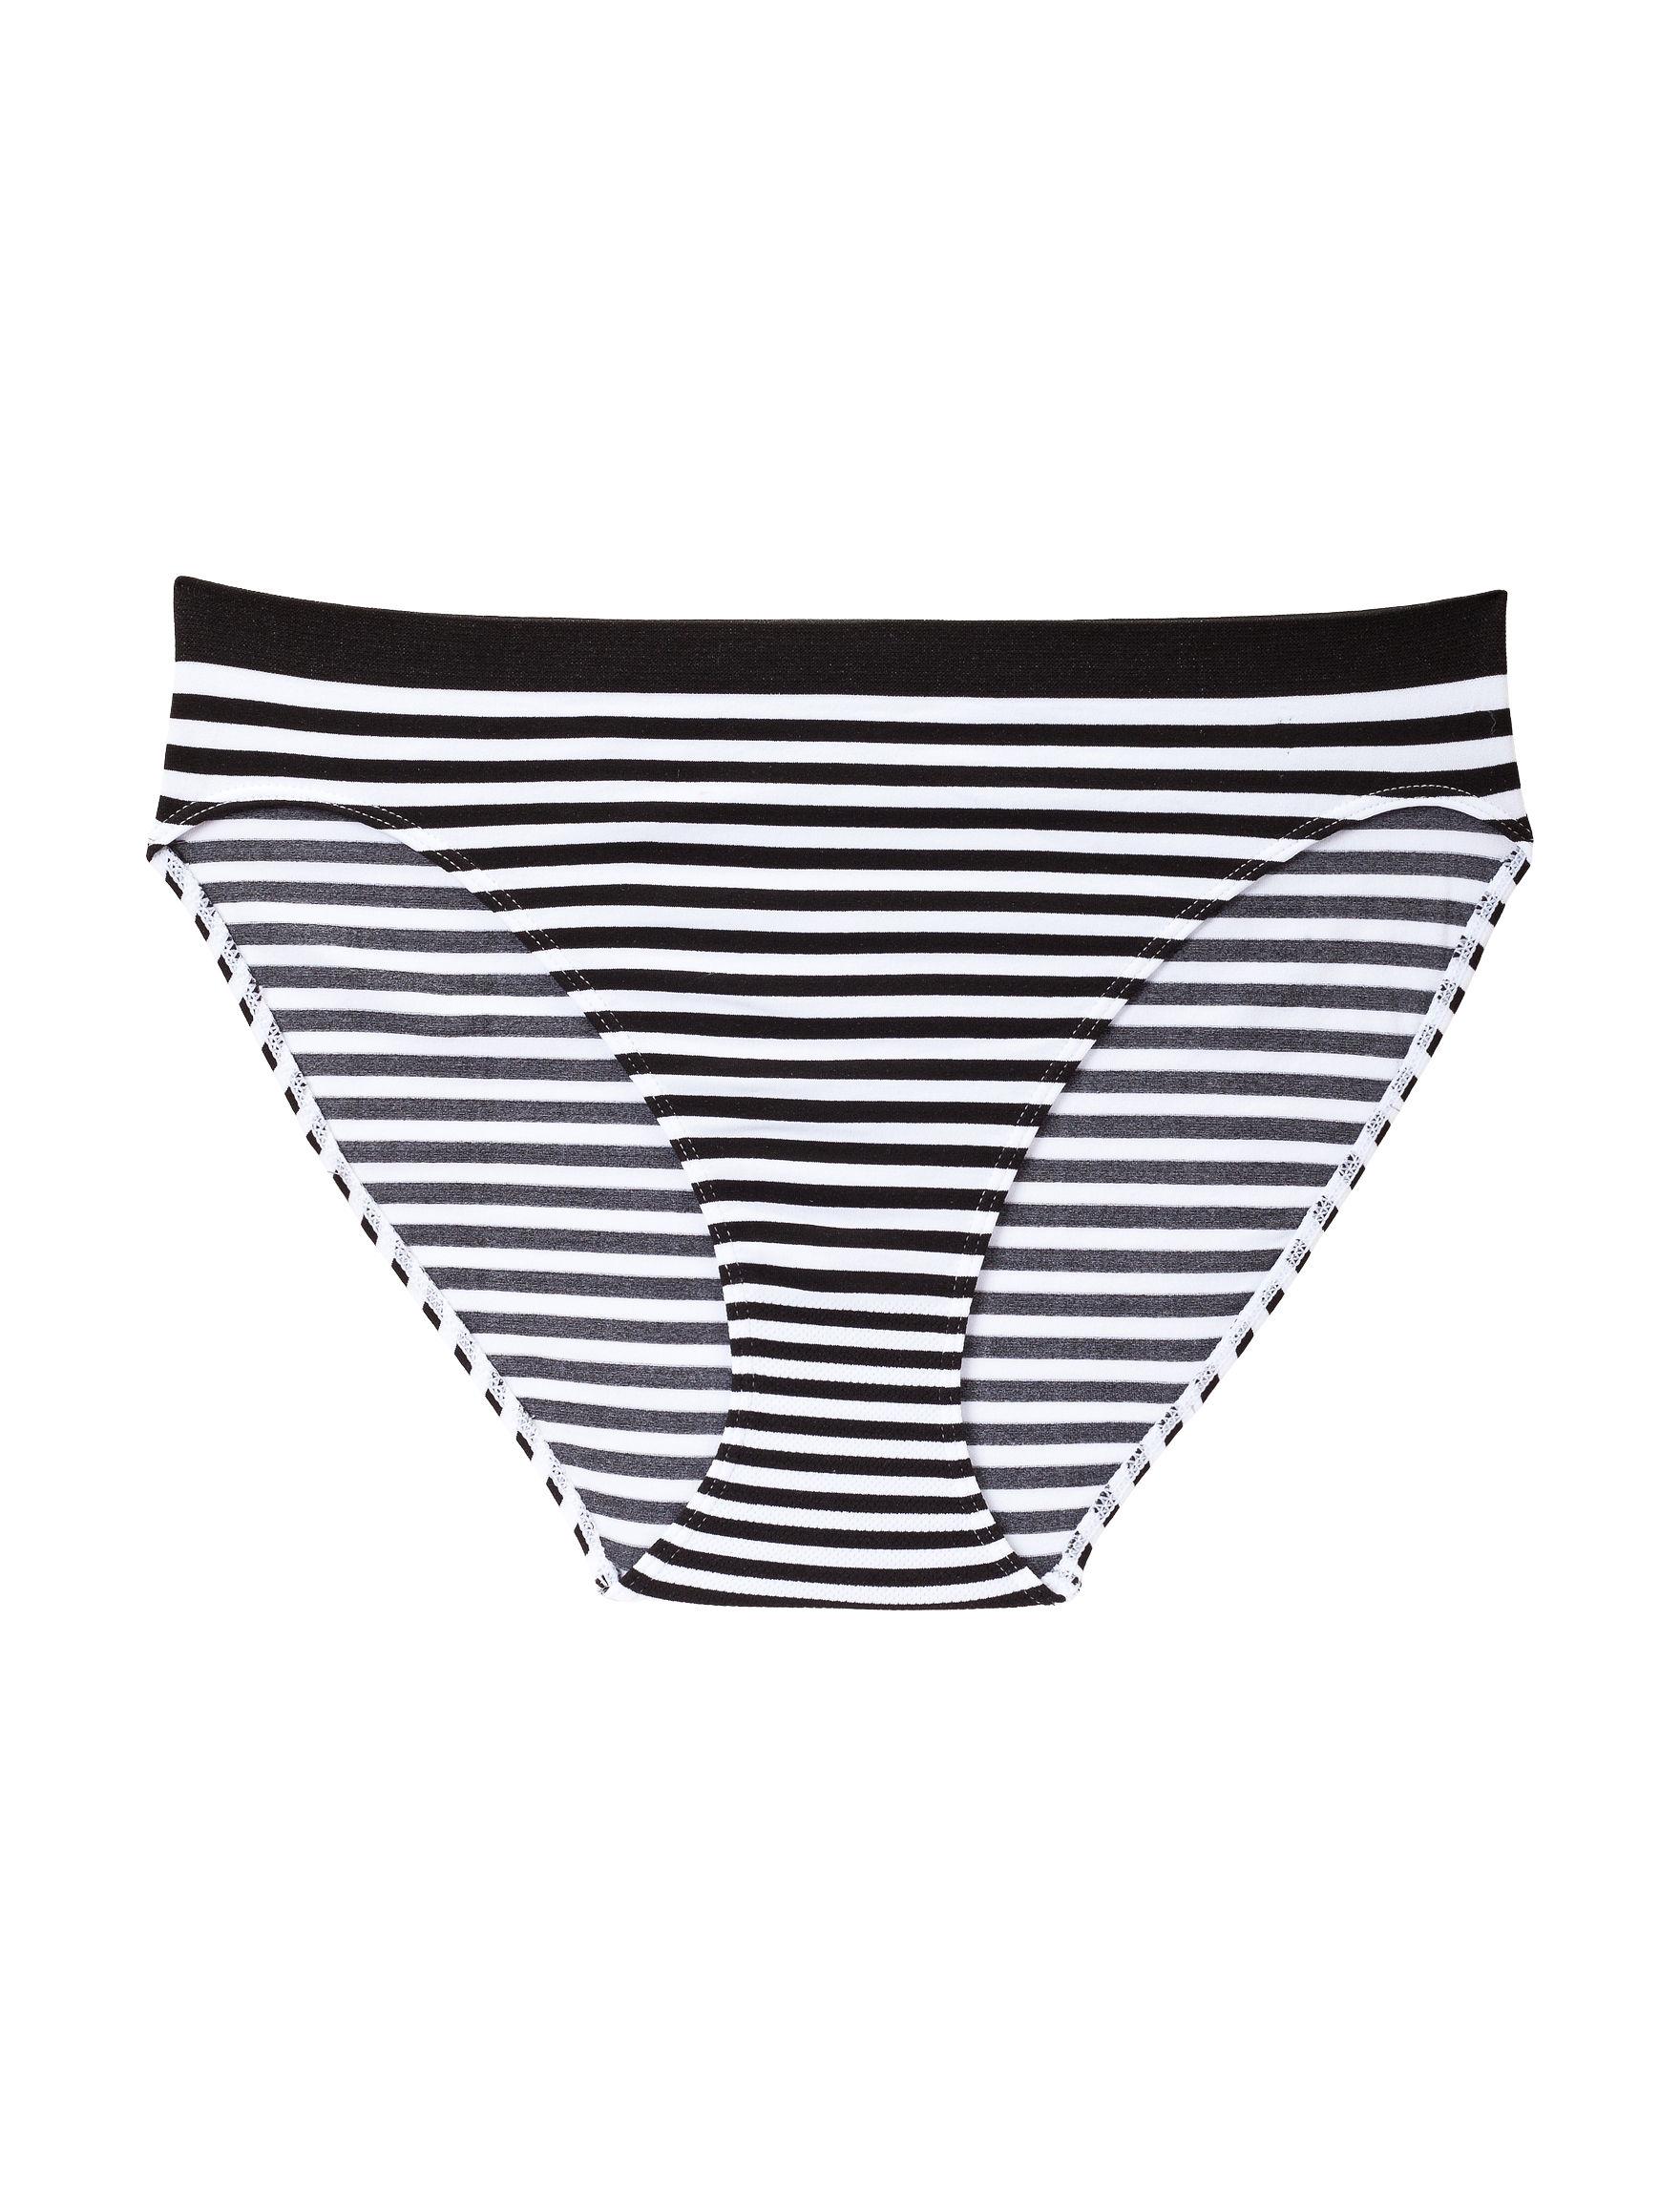 Rene Rofe Black / White Panties